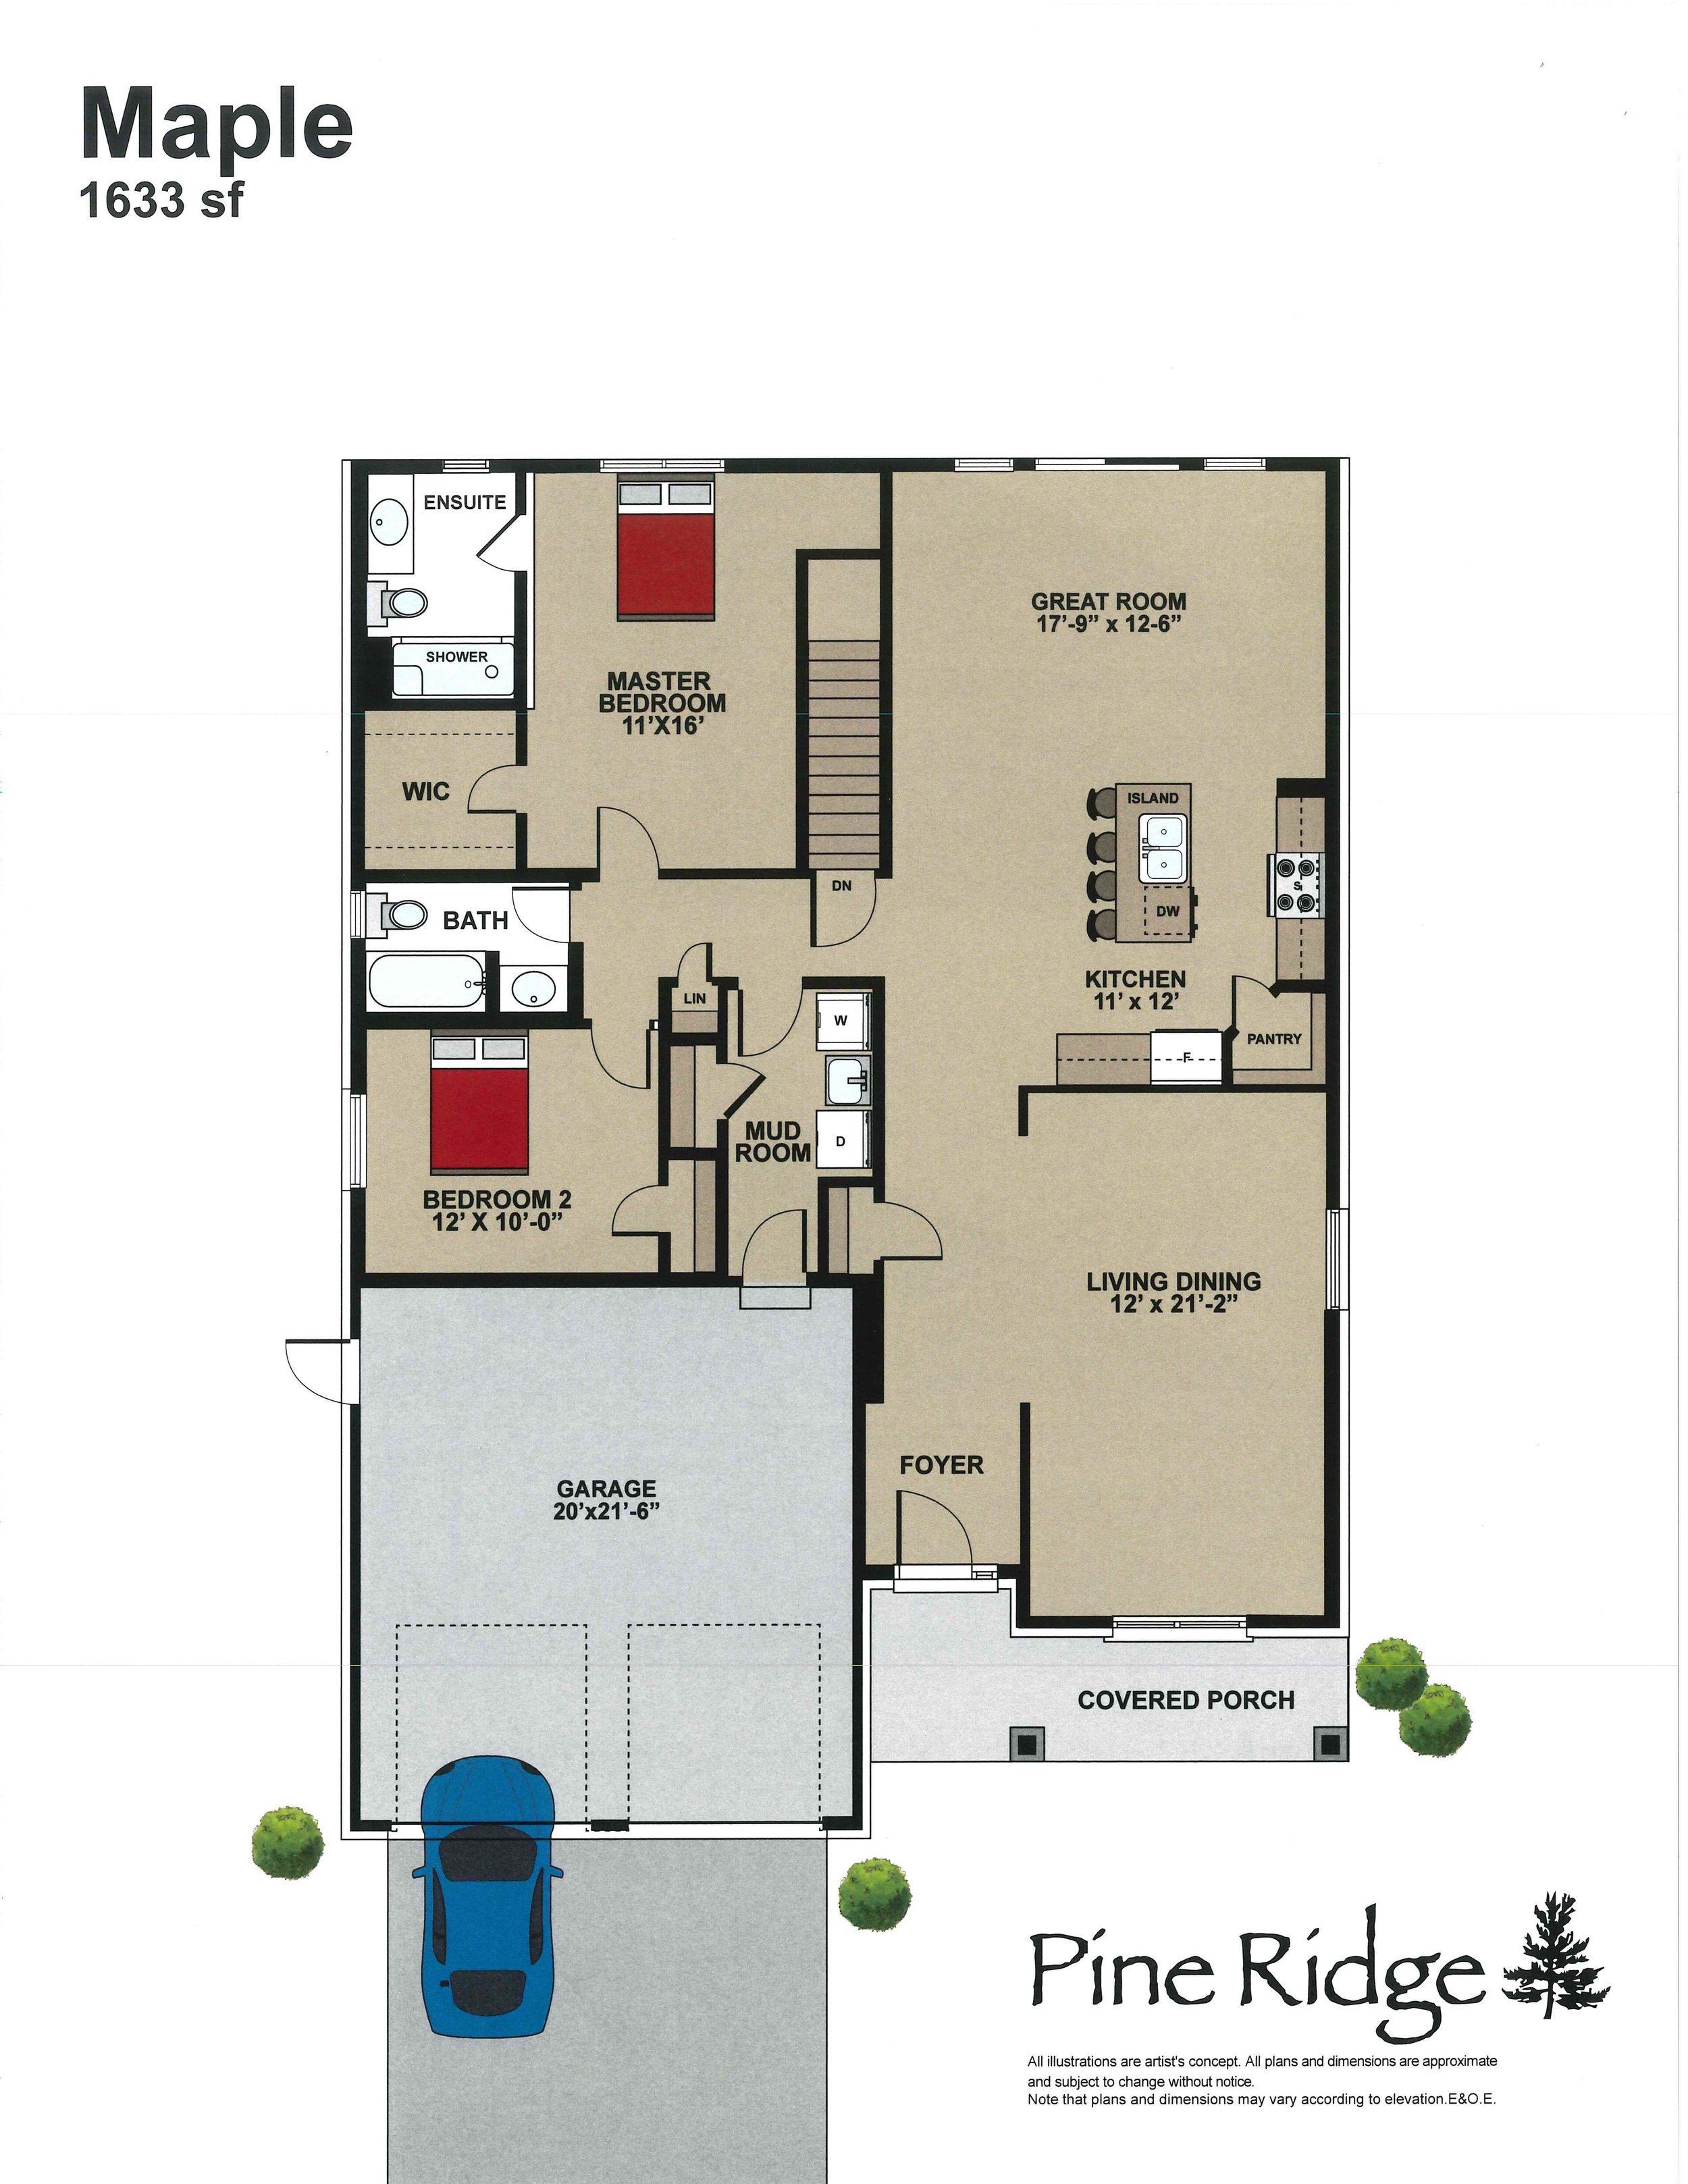 pineridge floorplans 1_Page_6.jpg